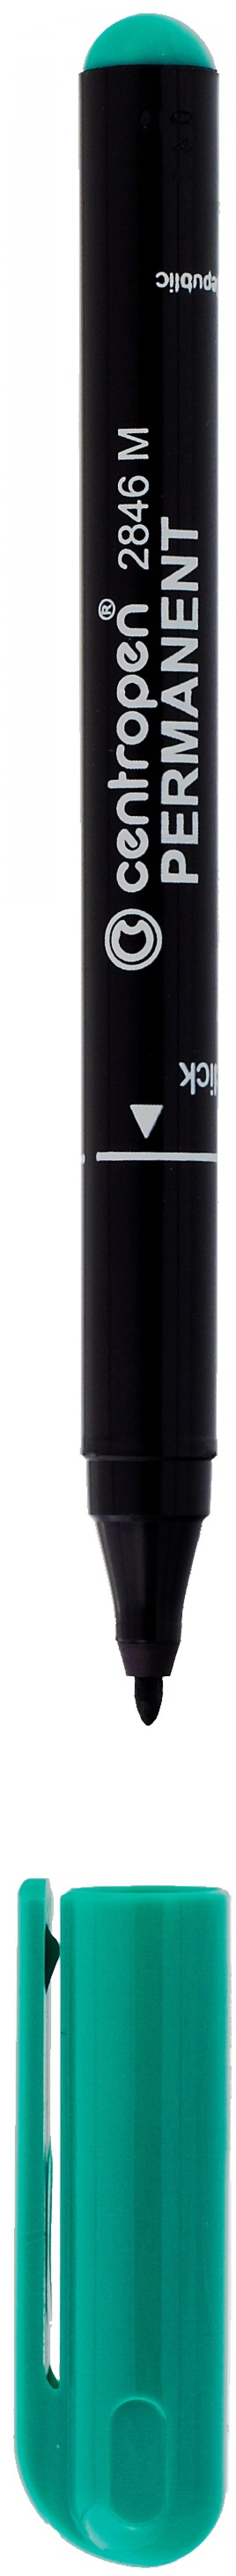 Маркер перманентный Centropen 2846/1З 1 мм зеленый 2846/1З маркер перманентный centropen 2846 1к красный 2846 1к